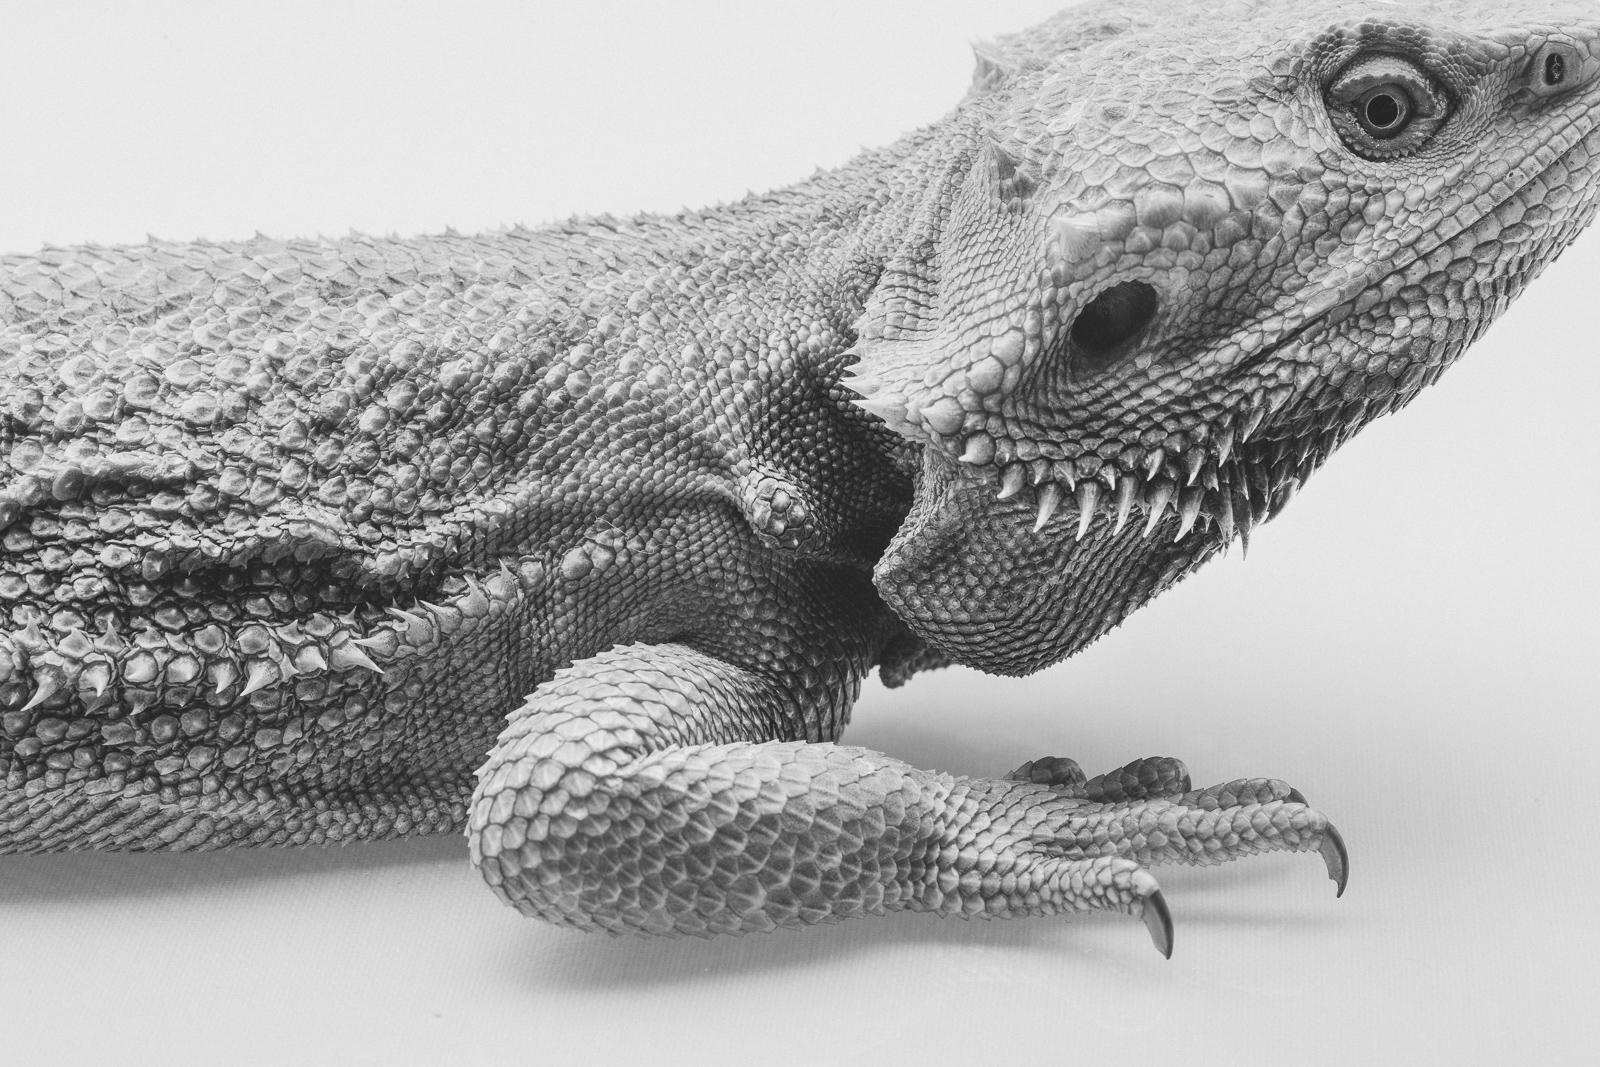 bearded-dragon